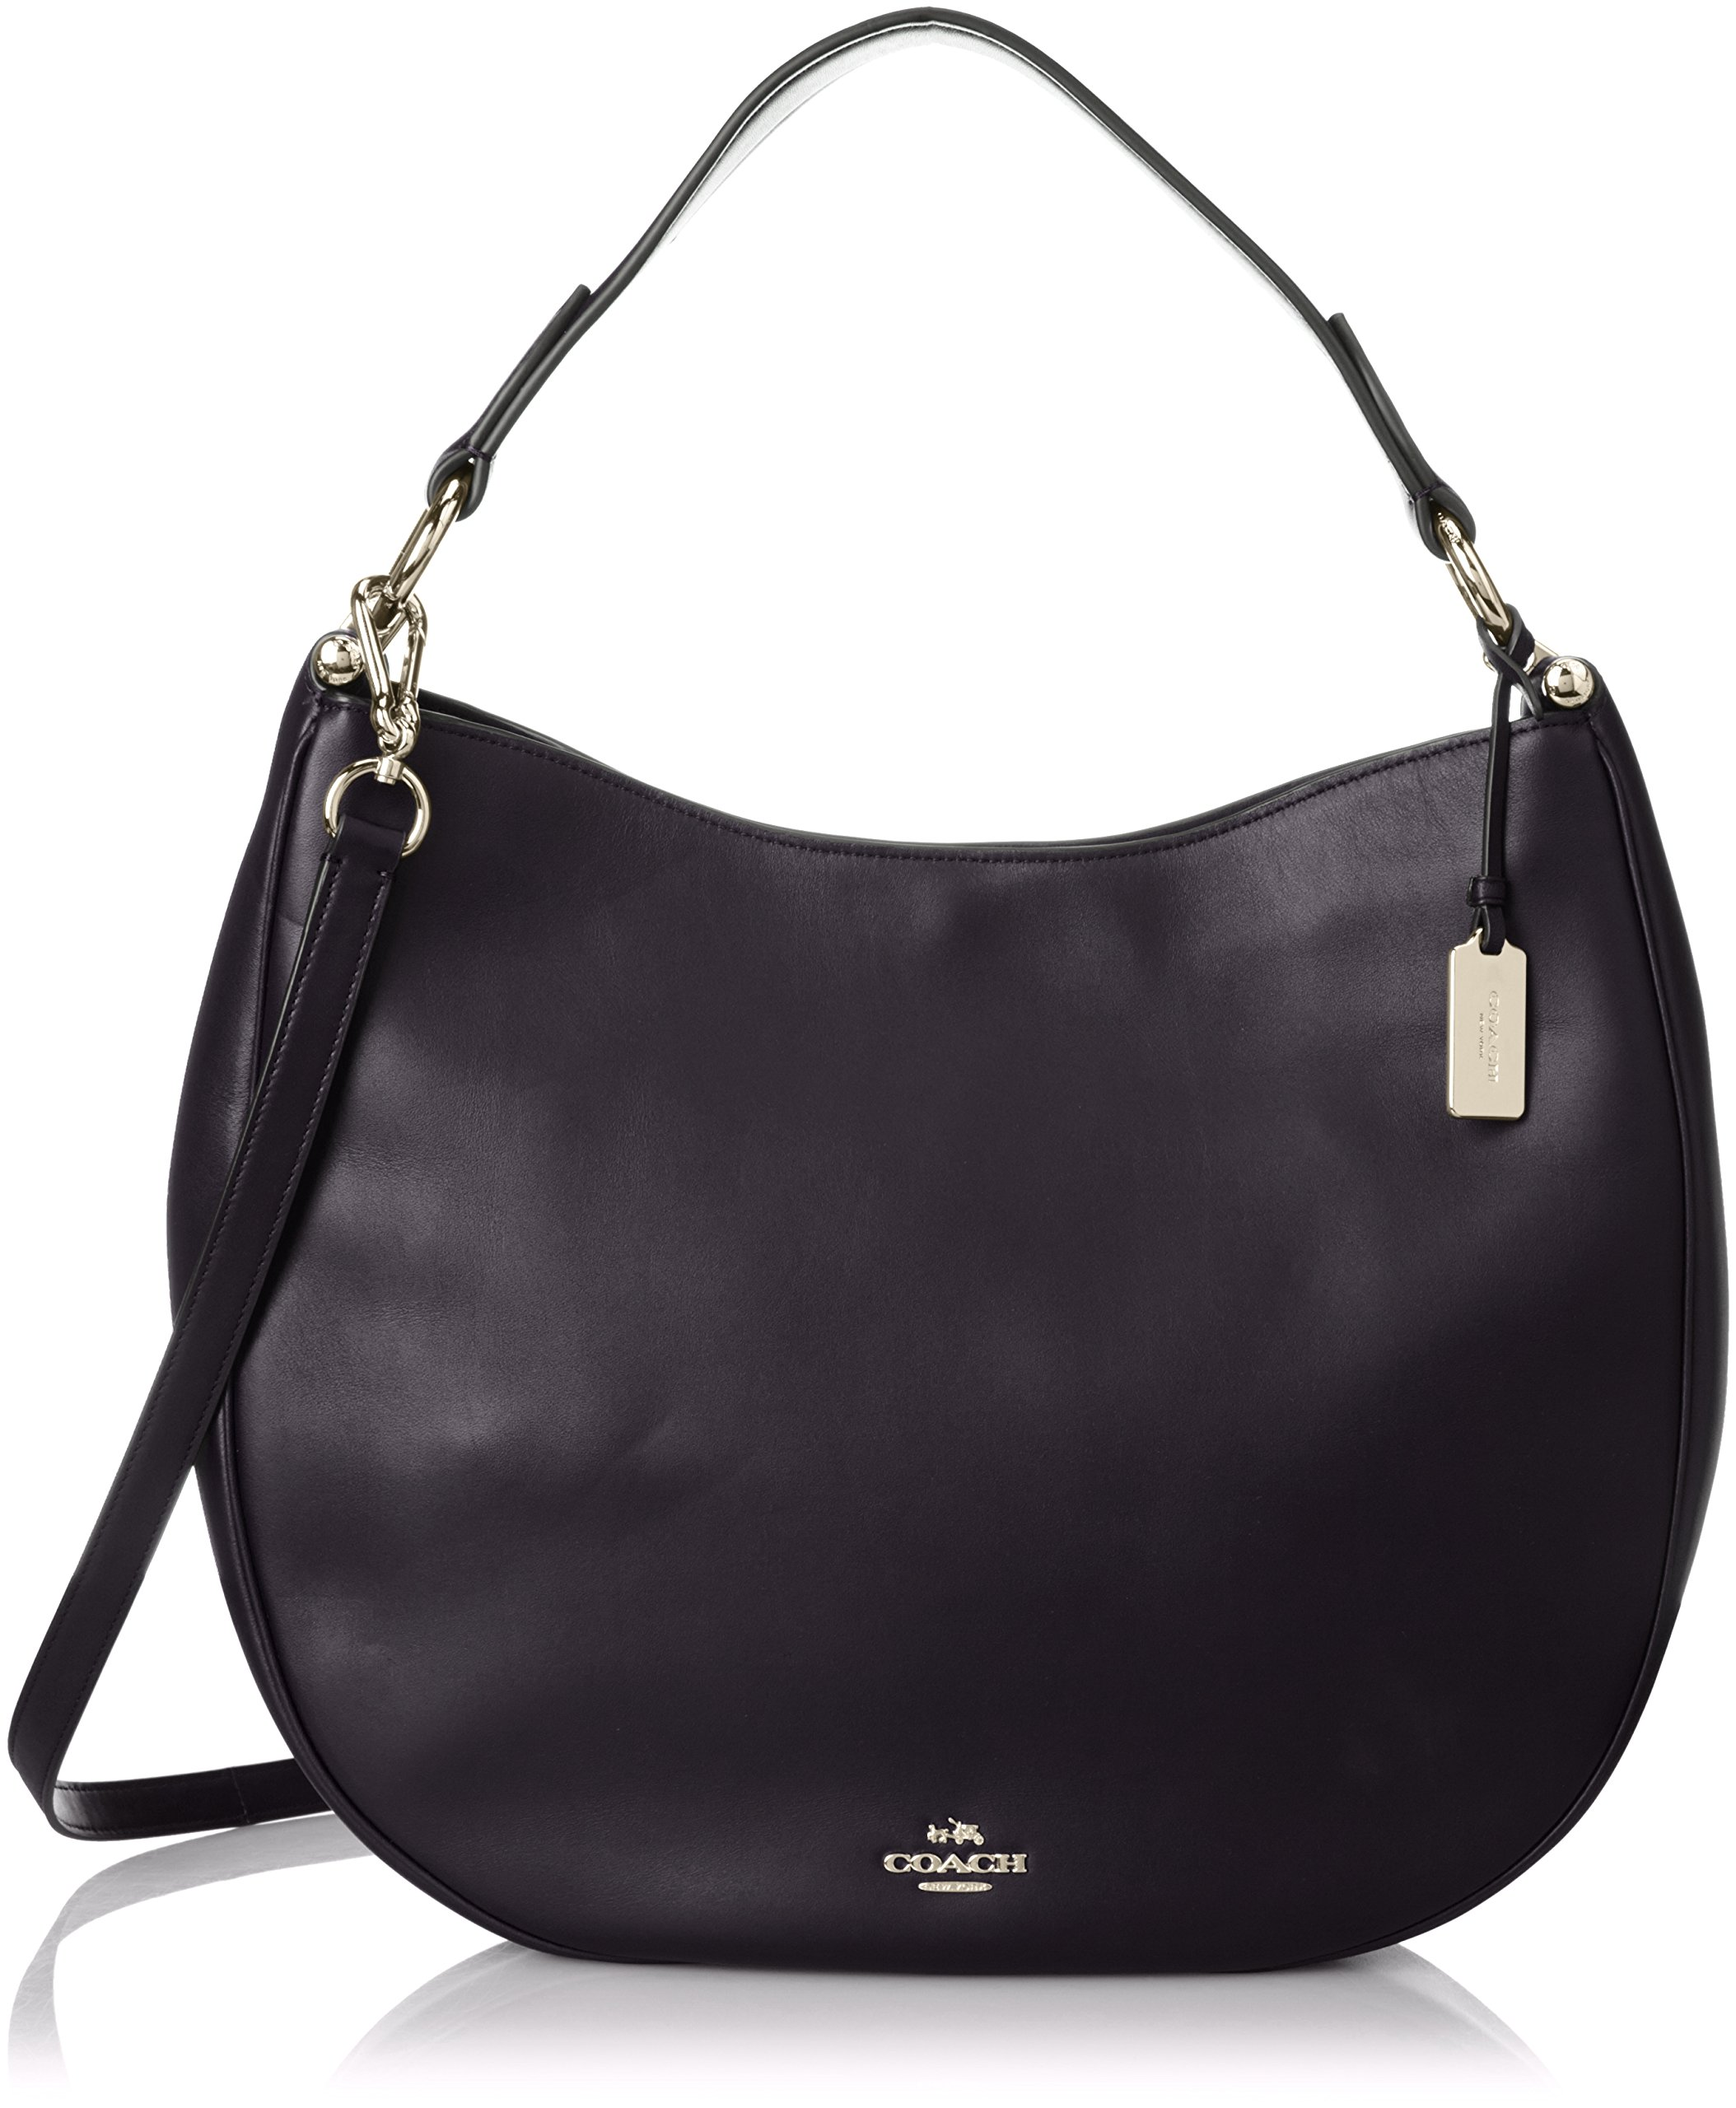 COACH Women's Natural Calf Nomad Hobo LI/Navy Handbag by Coach